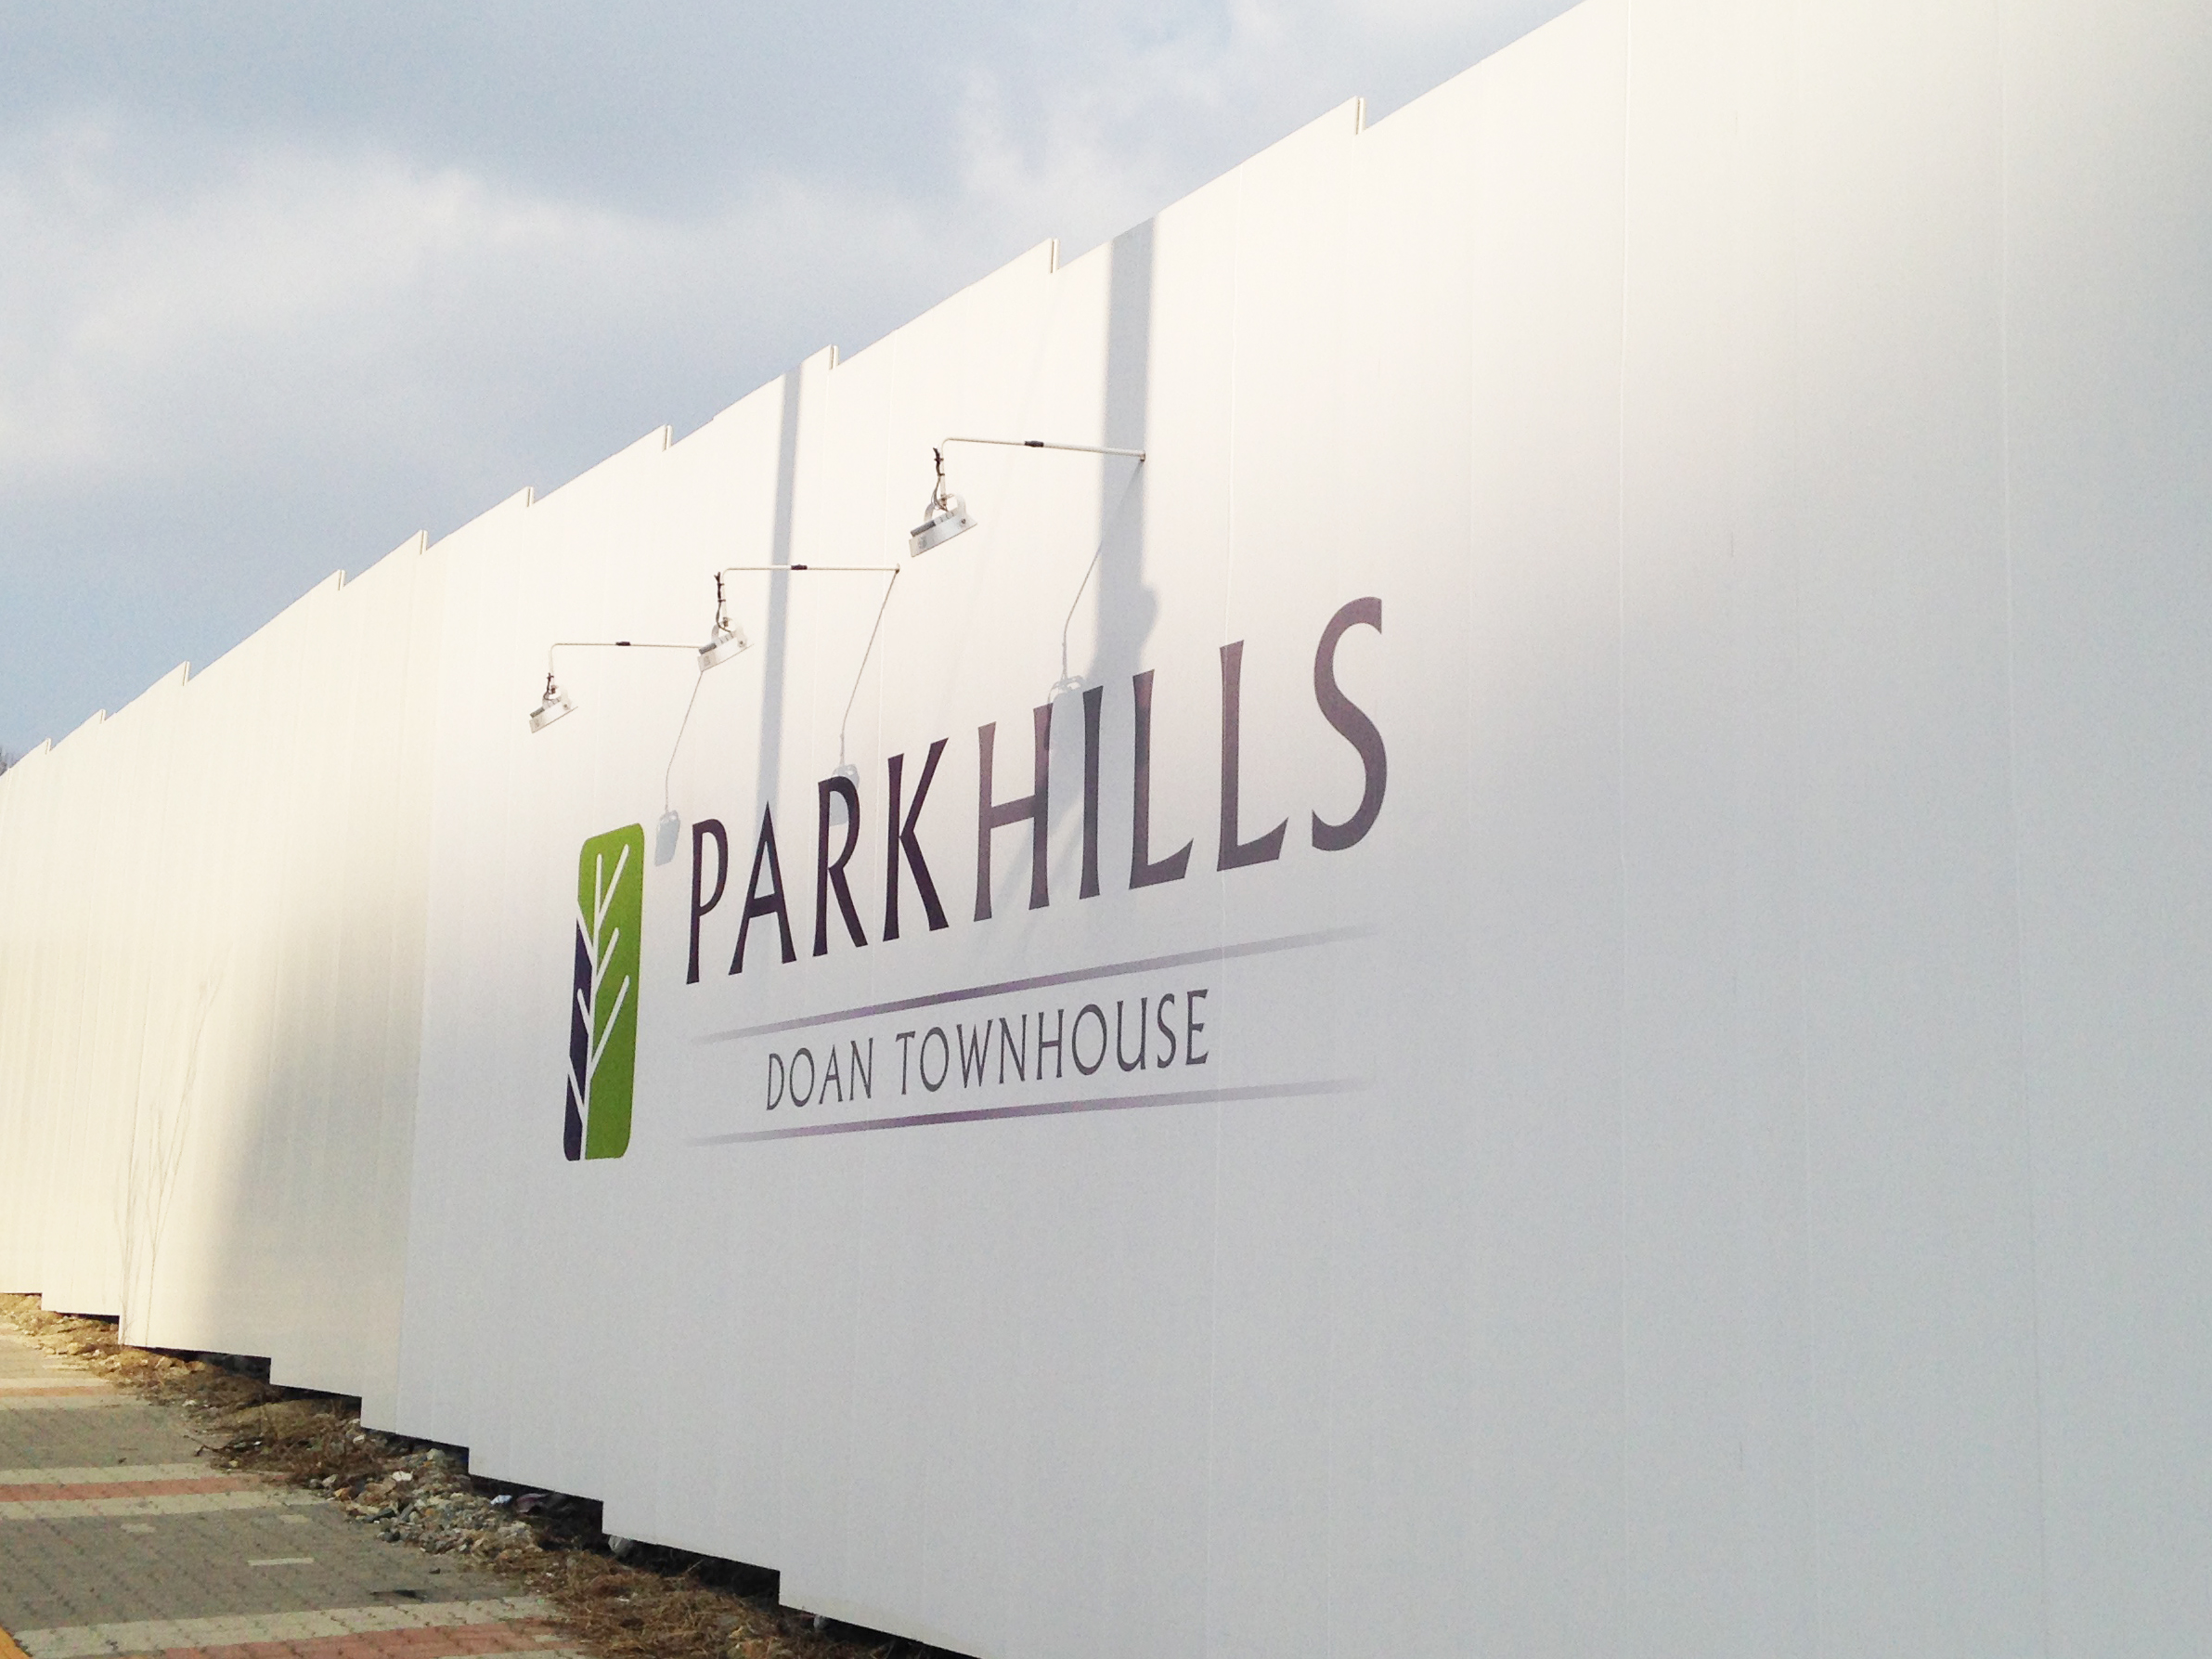 PARKHILLS